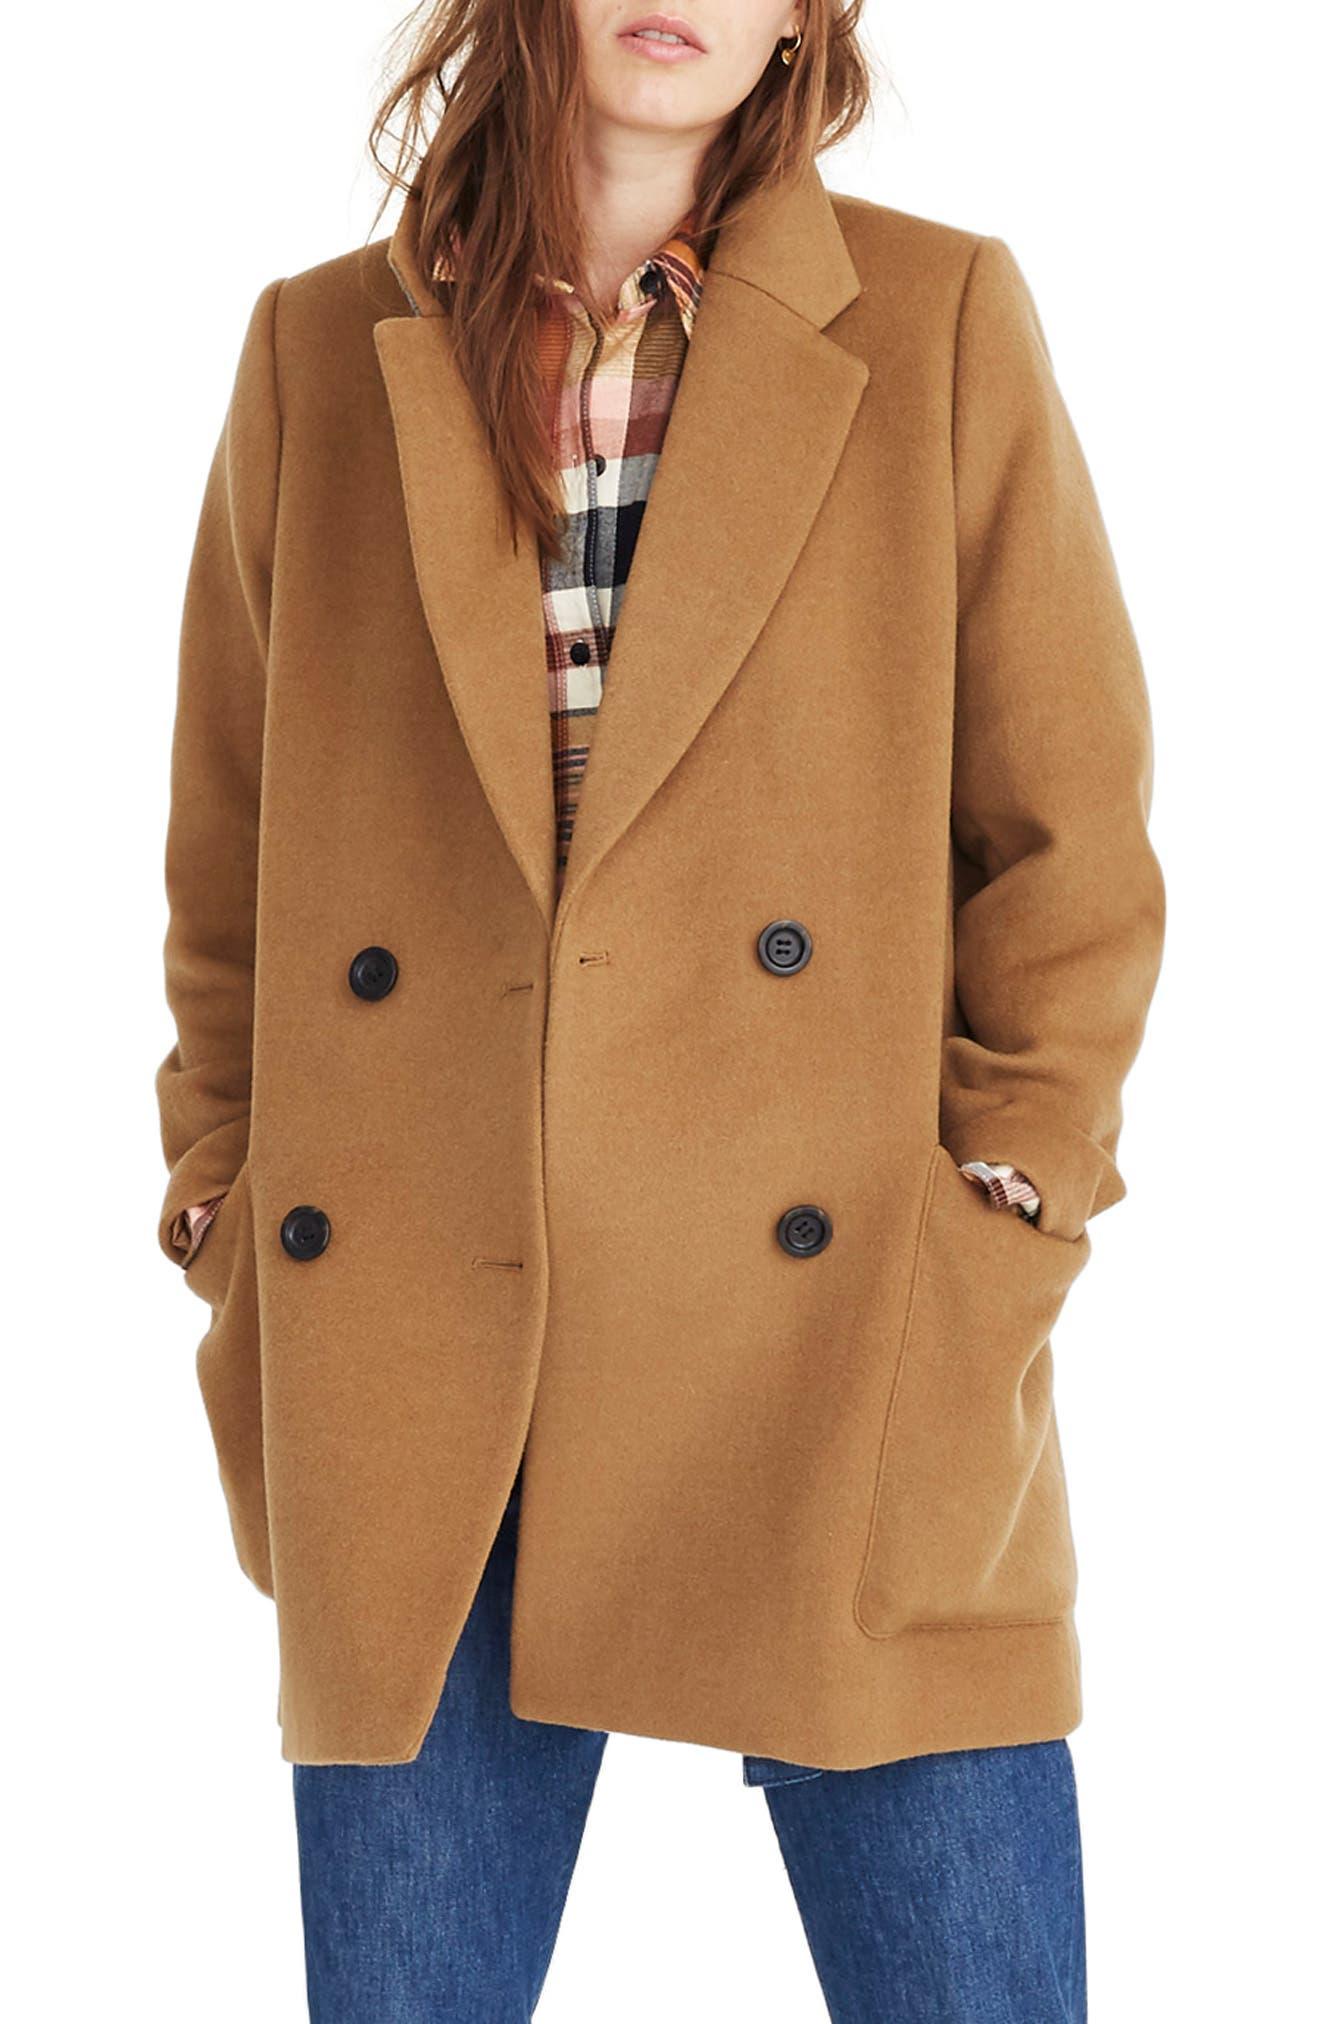 Hollis Double Breasted Coat,                             Main thumbnail 1, color,                             CLASSIC DESERT